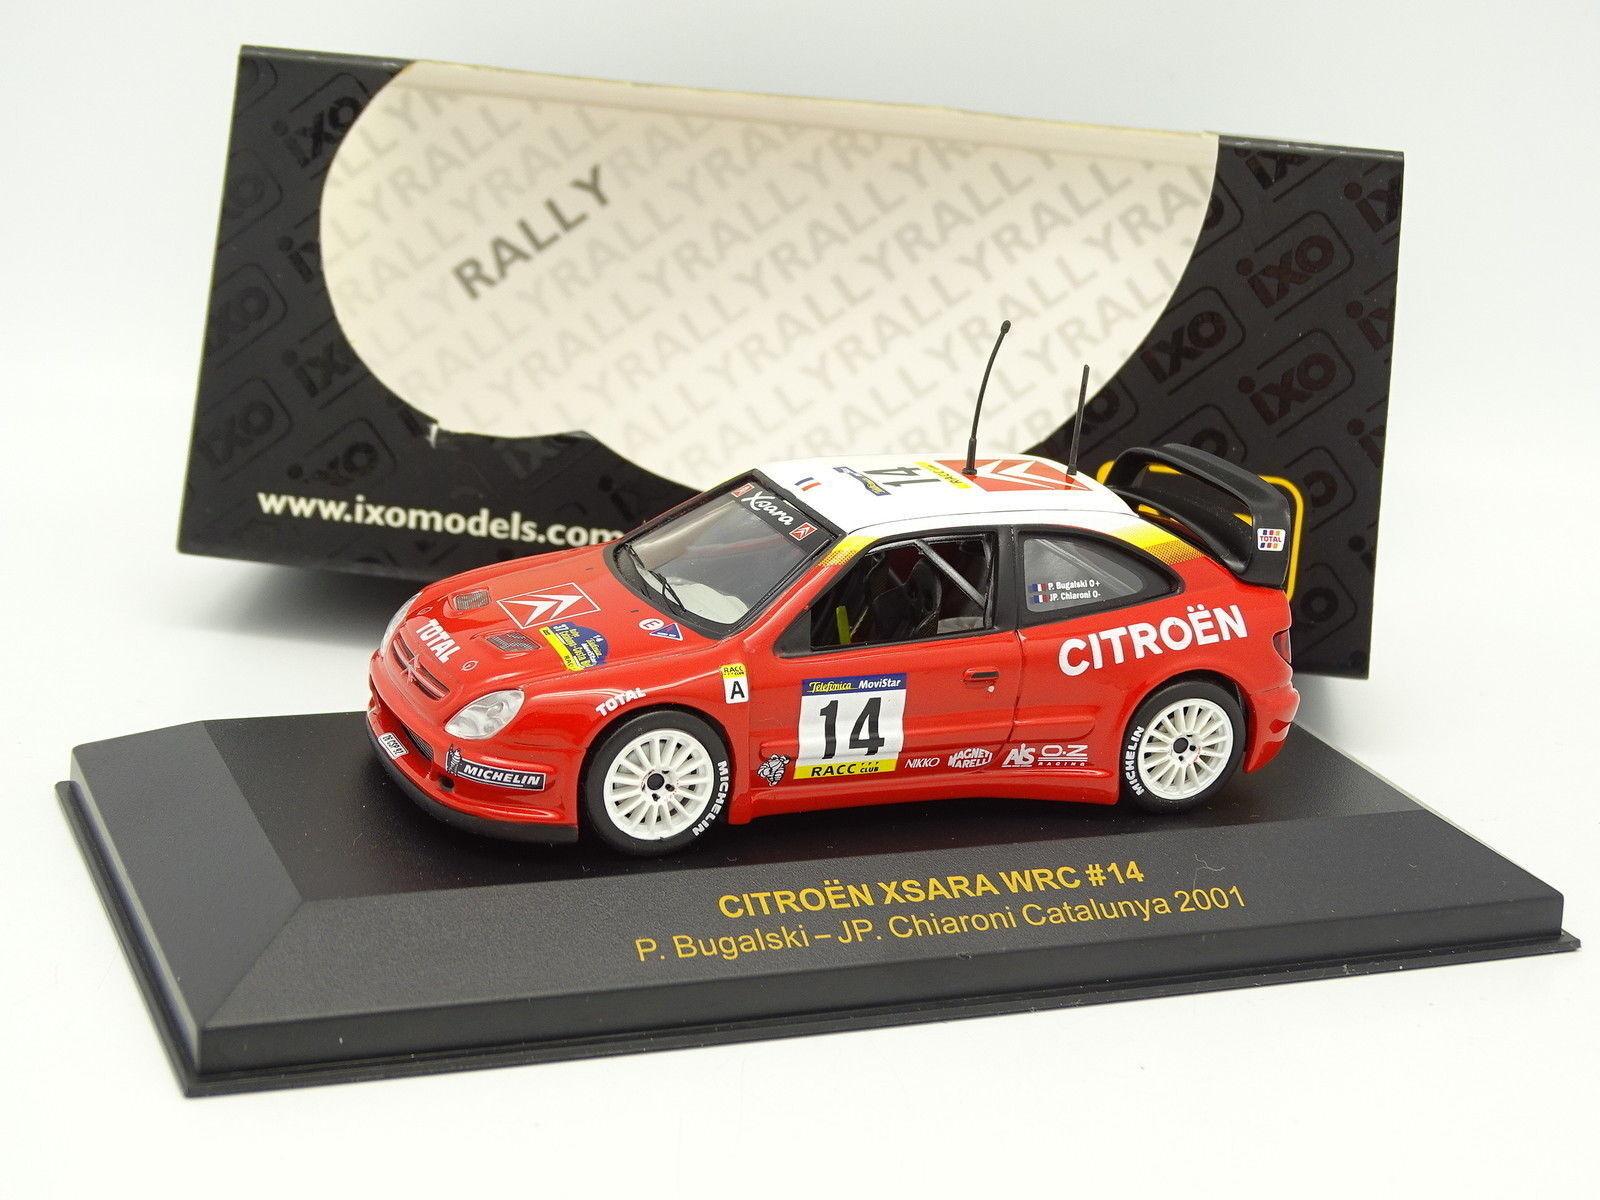 Ixo 1 43 - Citroen Xsara WRC N°14 Bugalski Rallye Catalogne 2001